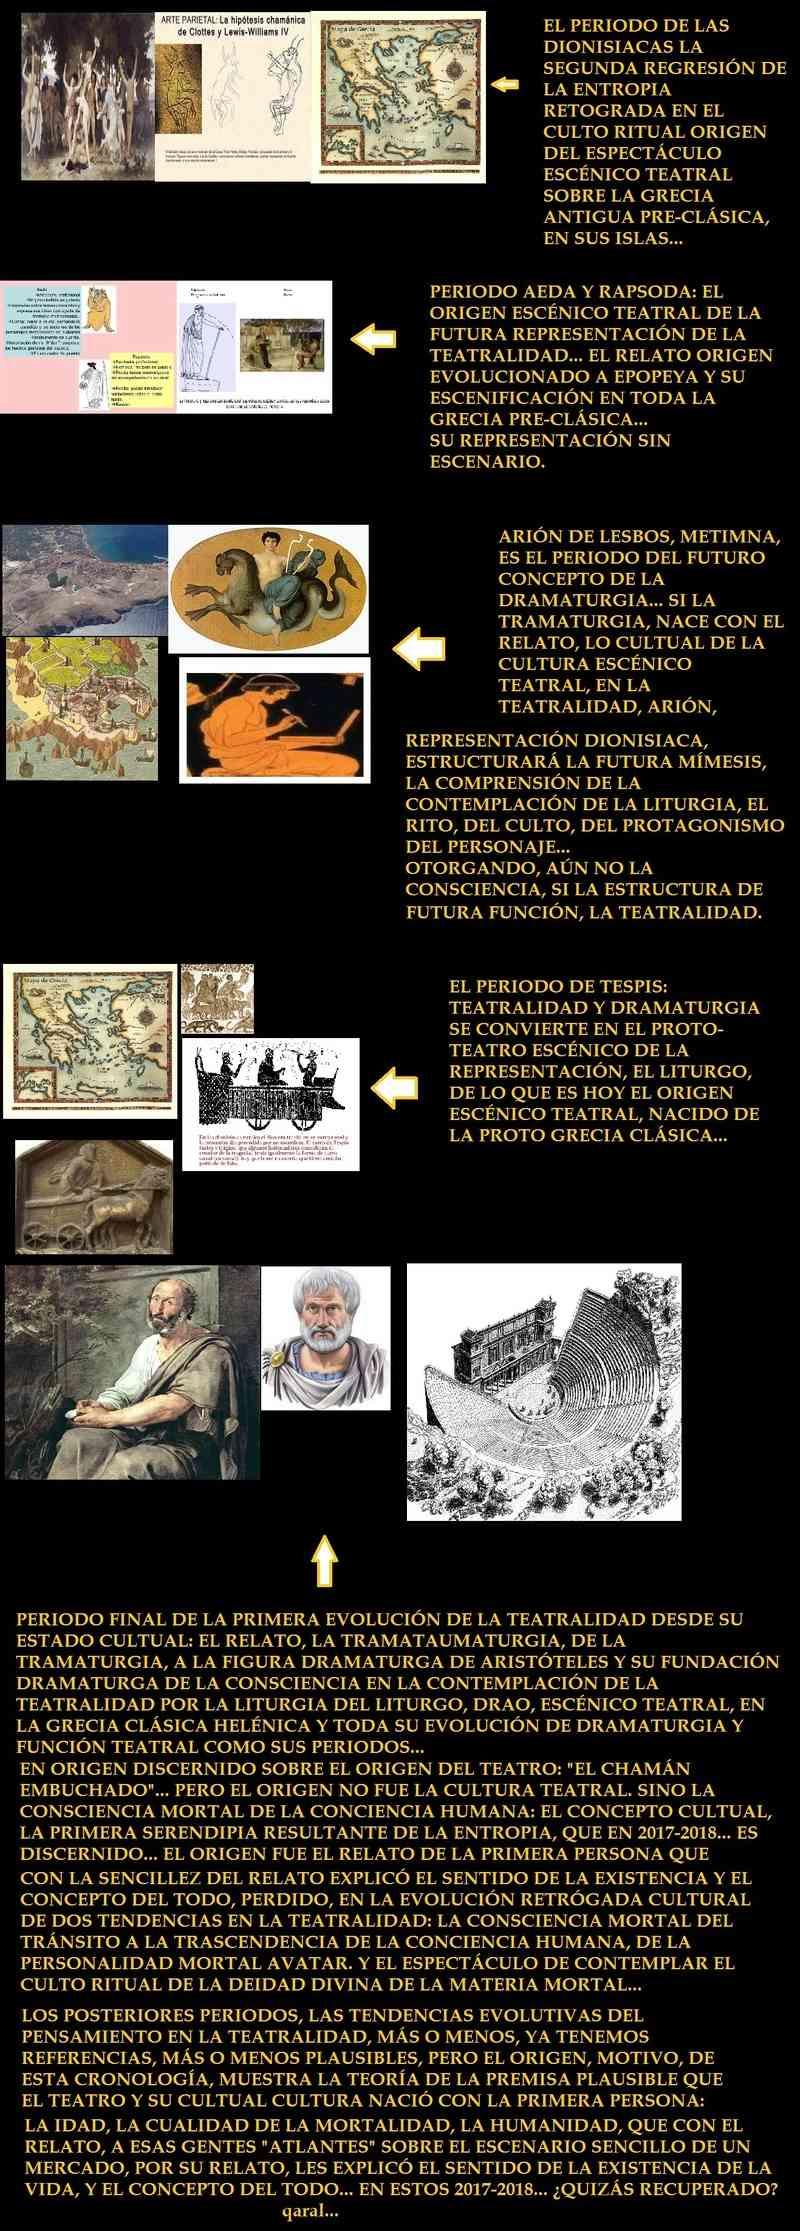 ¿ESTA ES LA CRONOLOGÍA EVOLUTIVA CULTUAL DE LA CULTURA TEATRAL? Gigant11